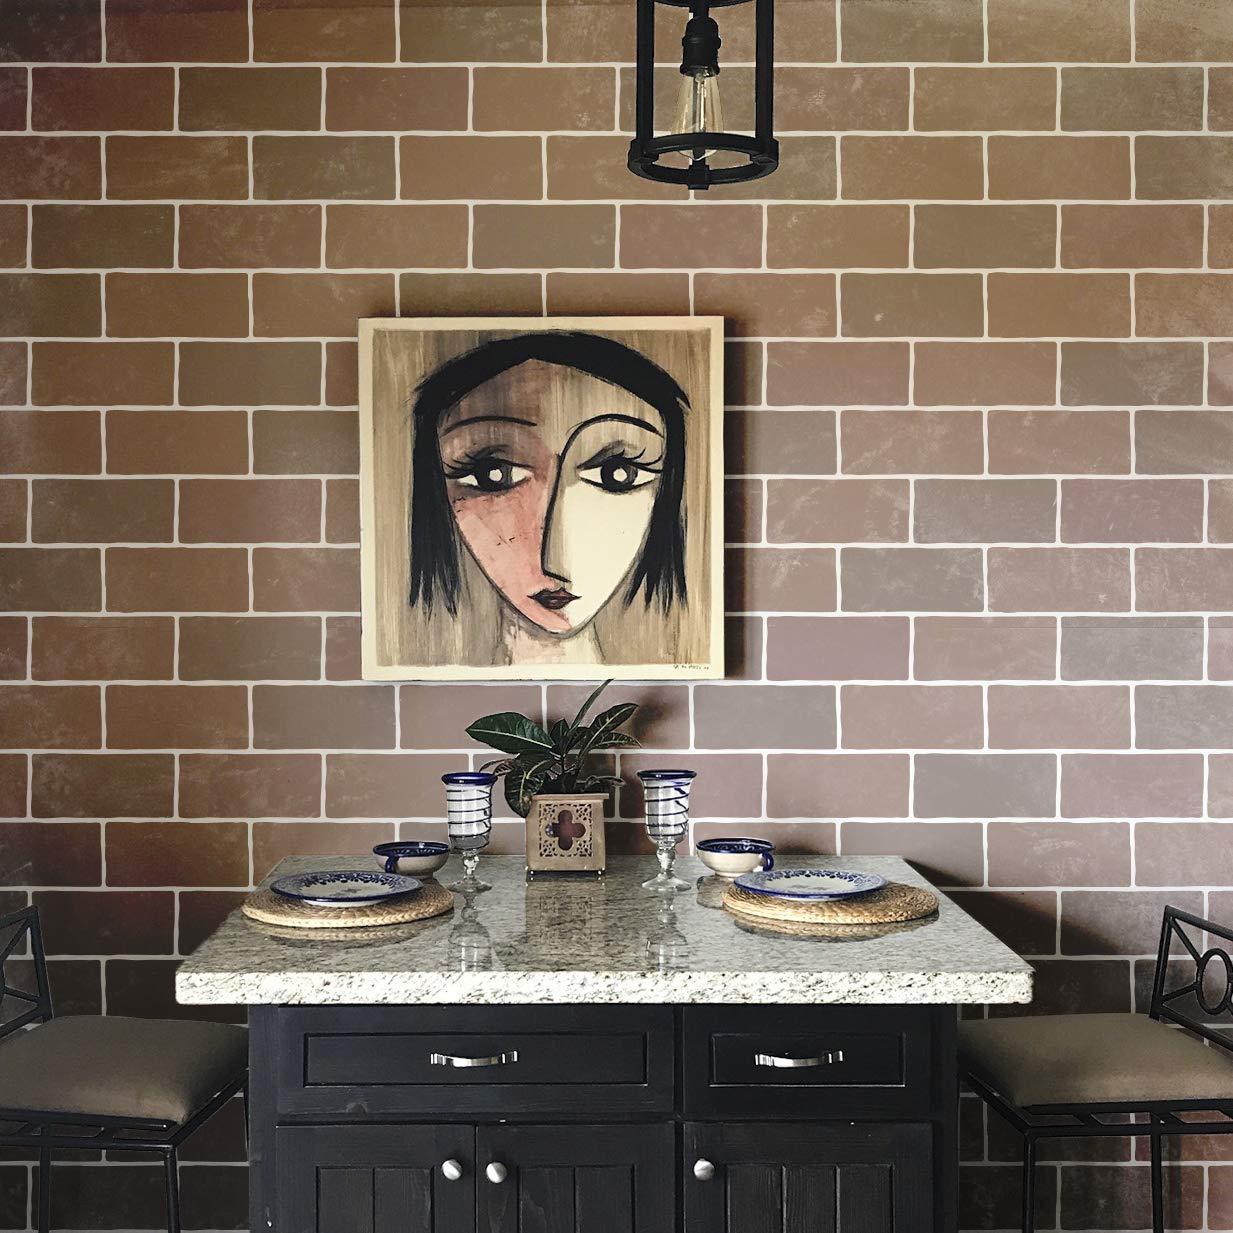 Brick Wall Stencil - Faux Brick Wallpaper Design - Painted Brick Wall or Floor Pattern Royal Design Studio Stencils